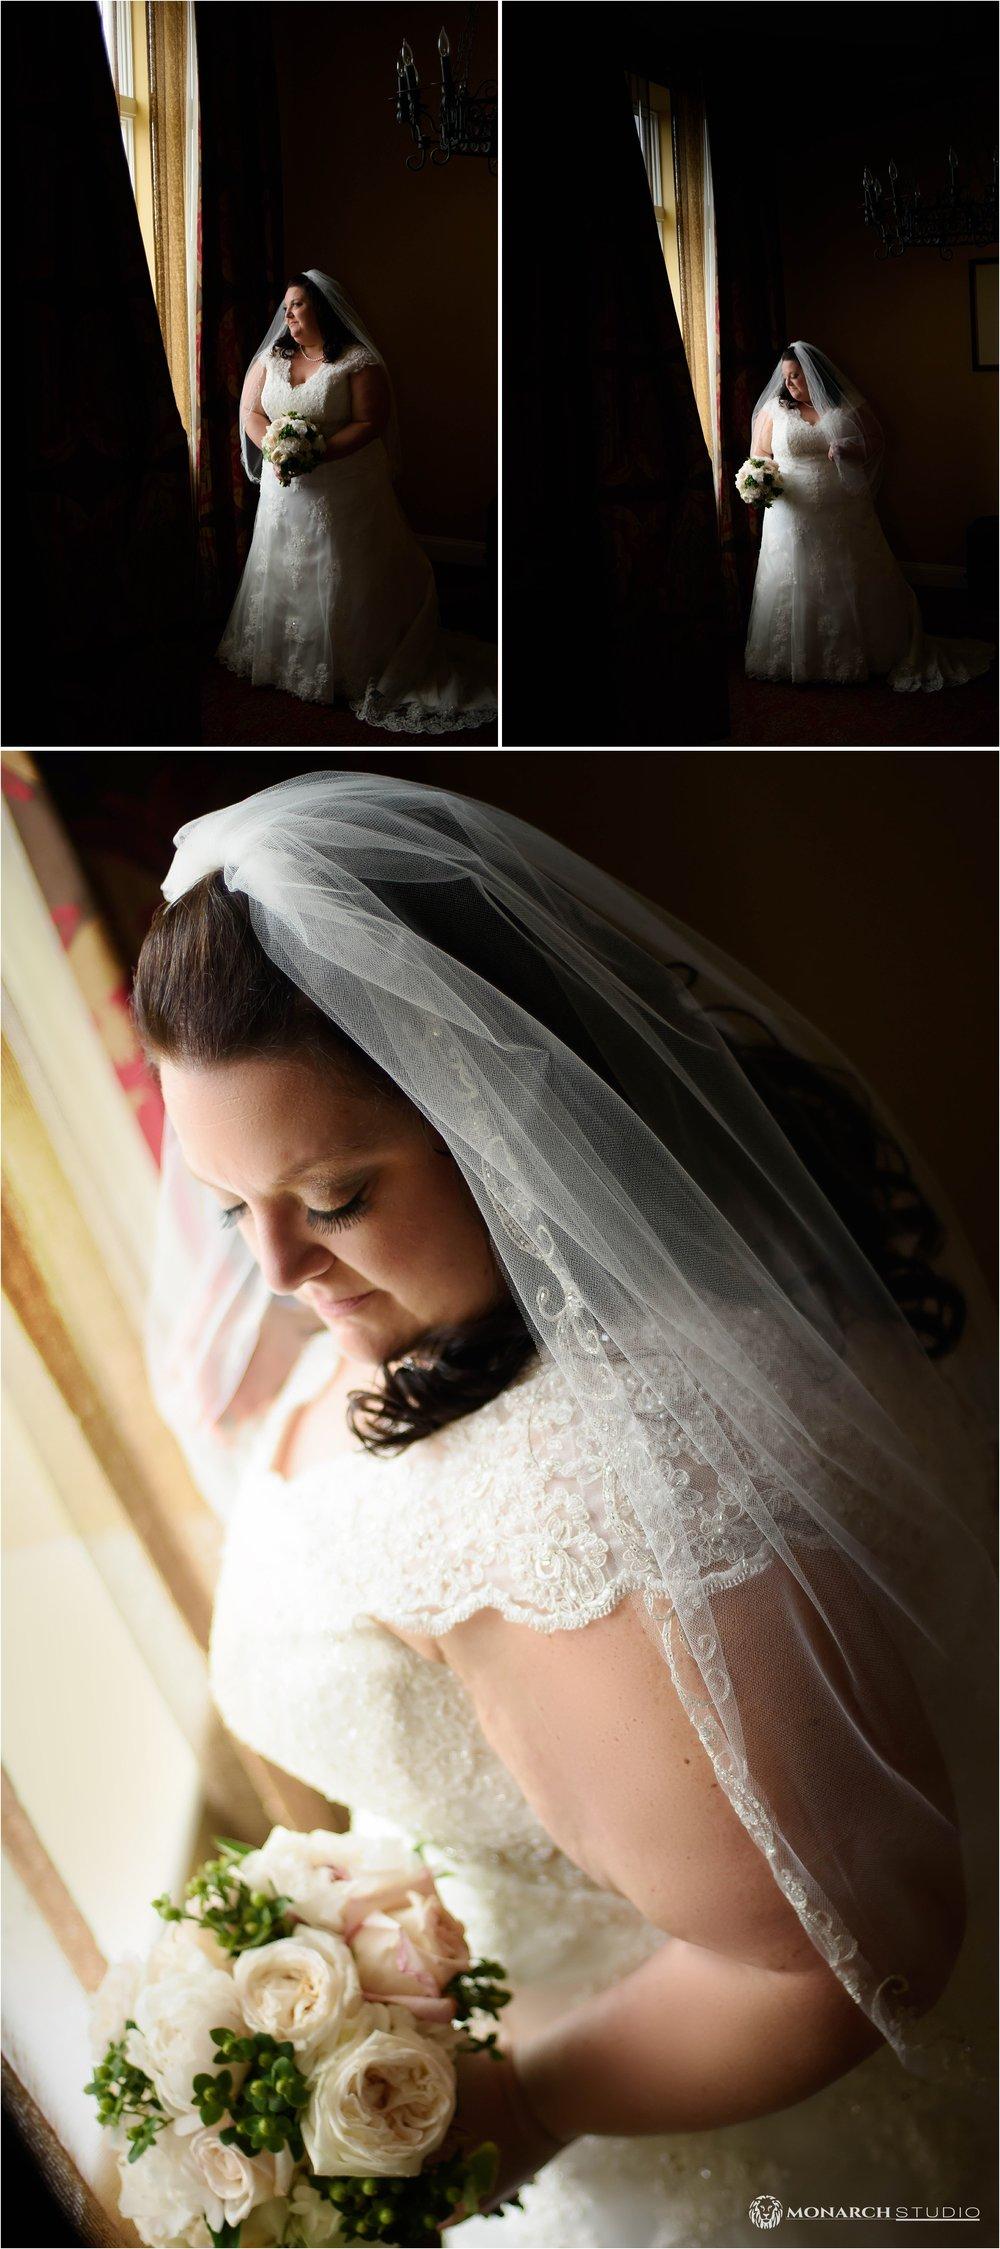 st-augustine-photographer-intimate-wedding-011.jpg